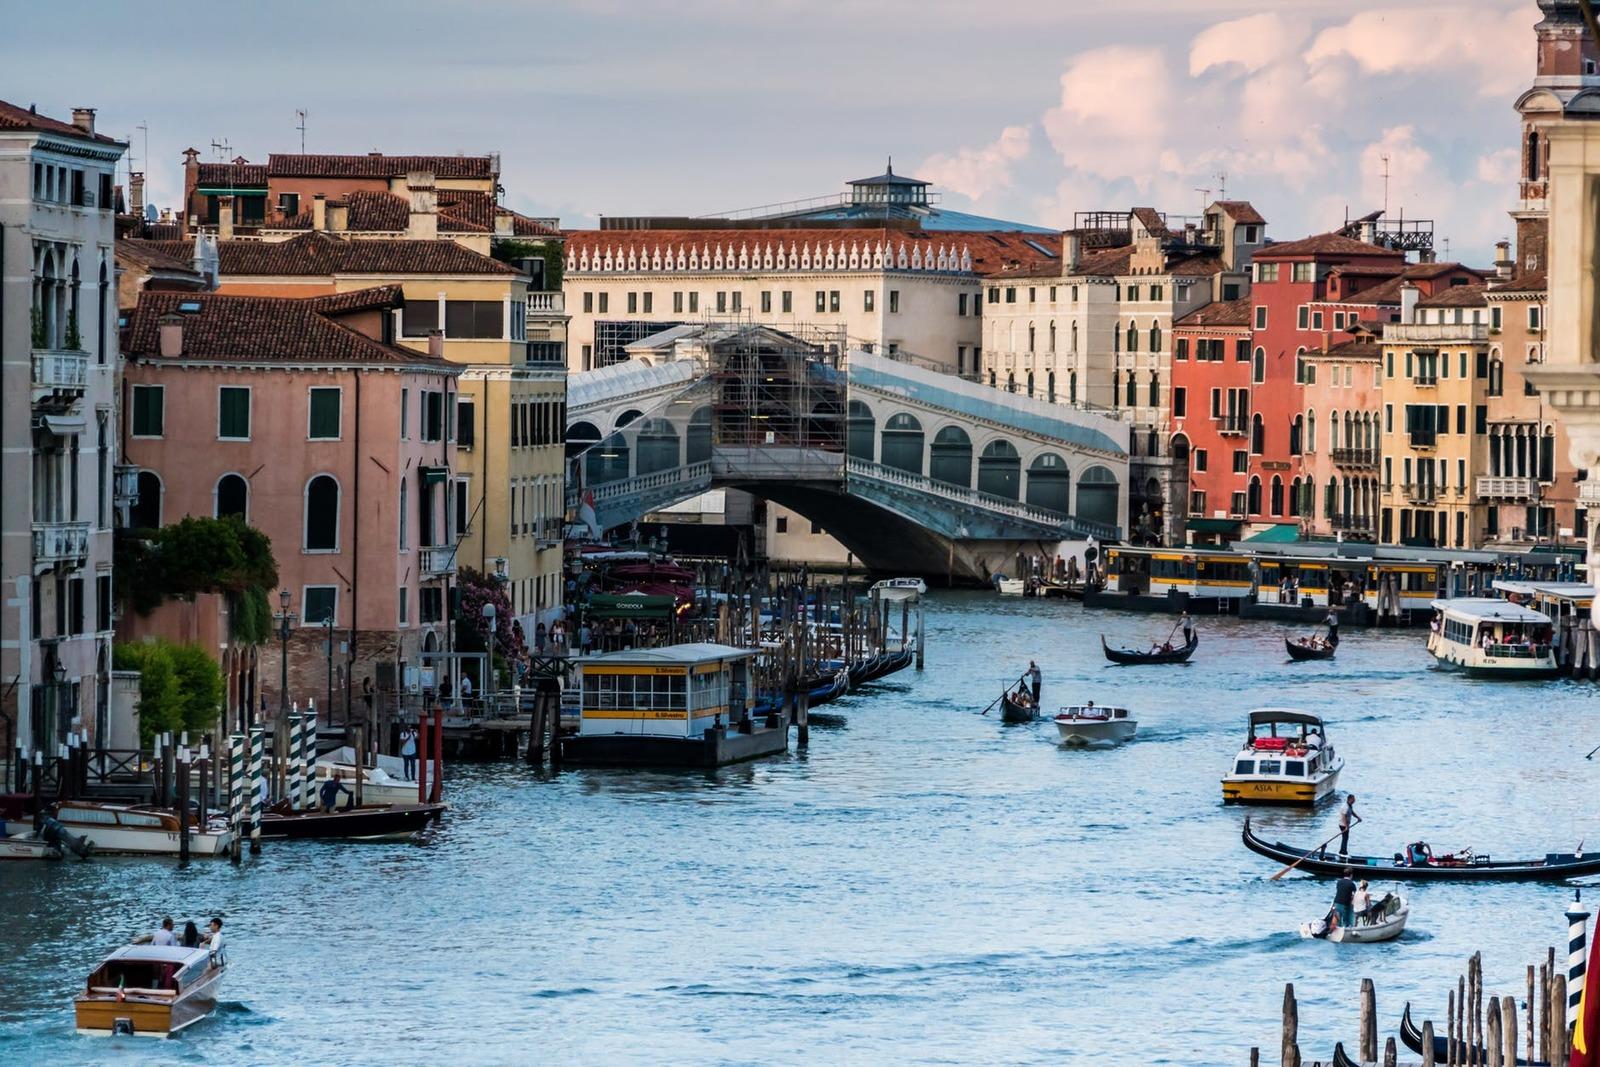 Rialto Bridge – Depicting city's rustic charm